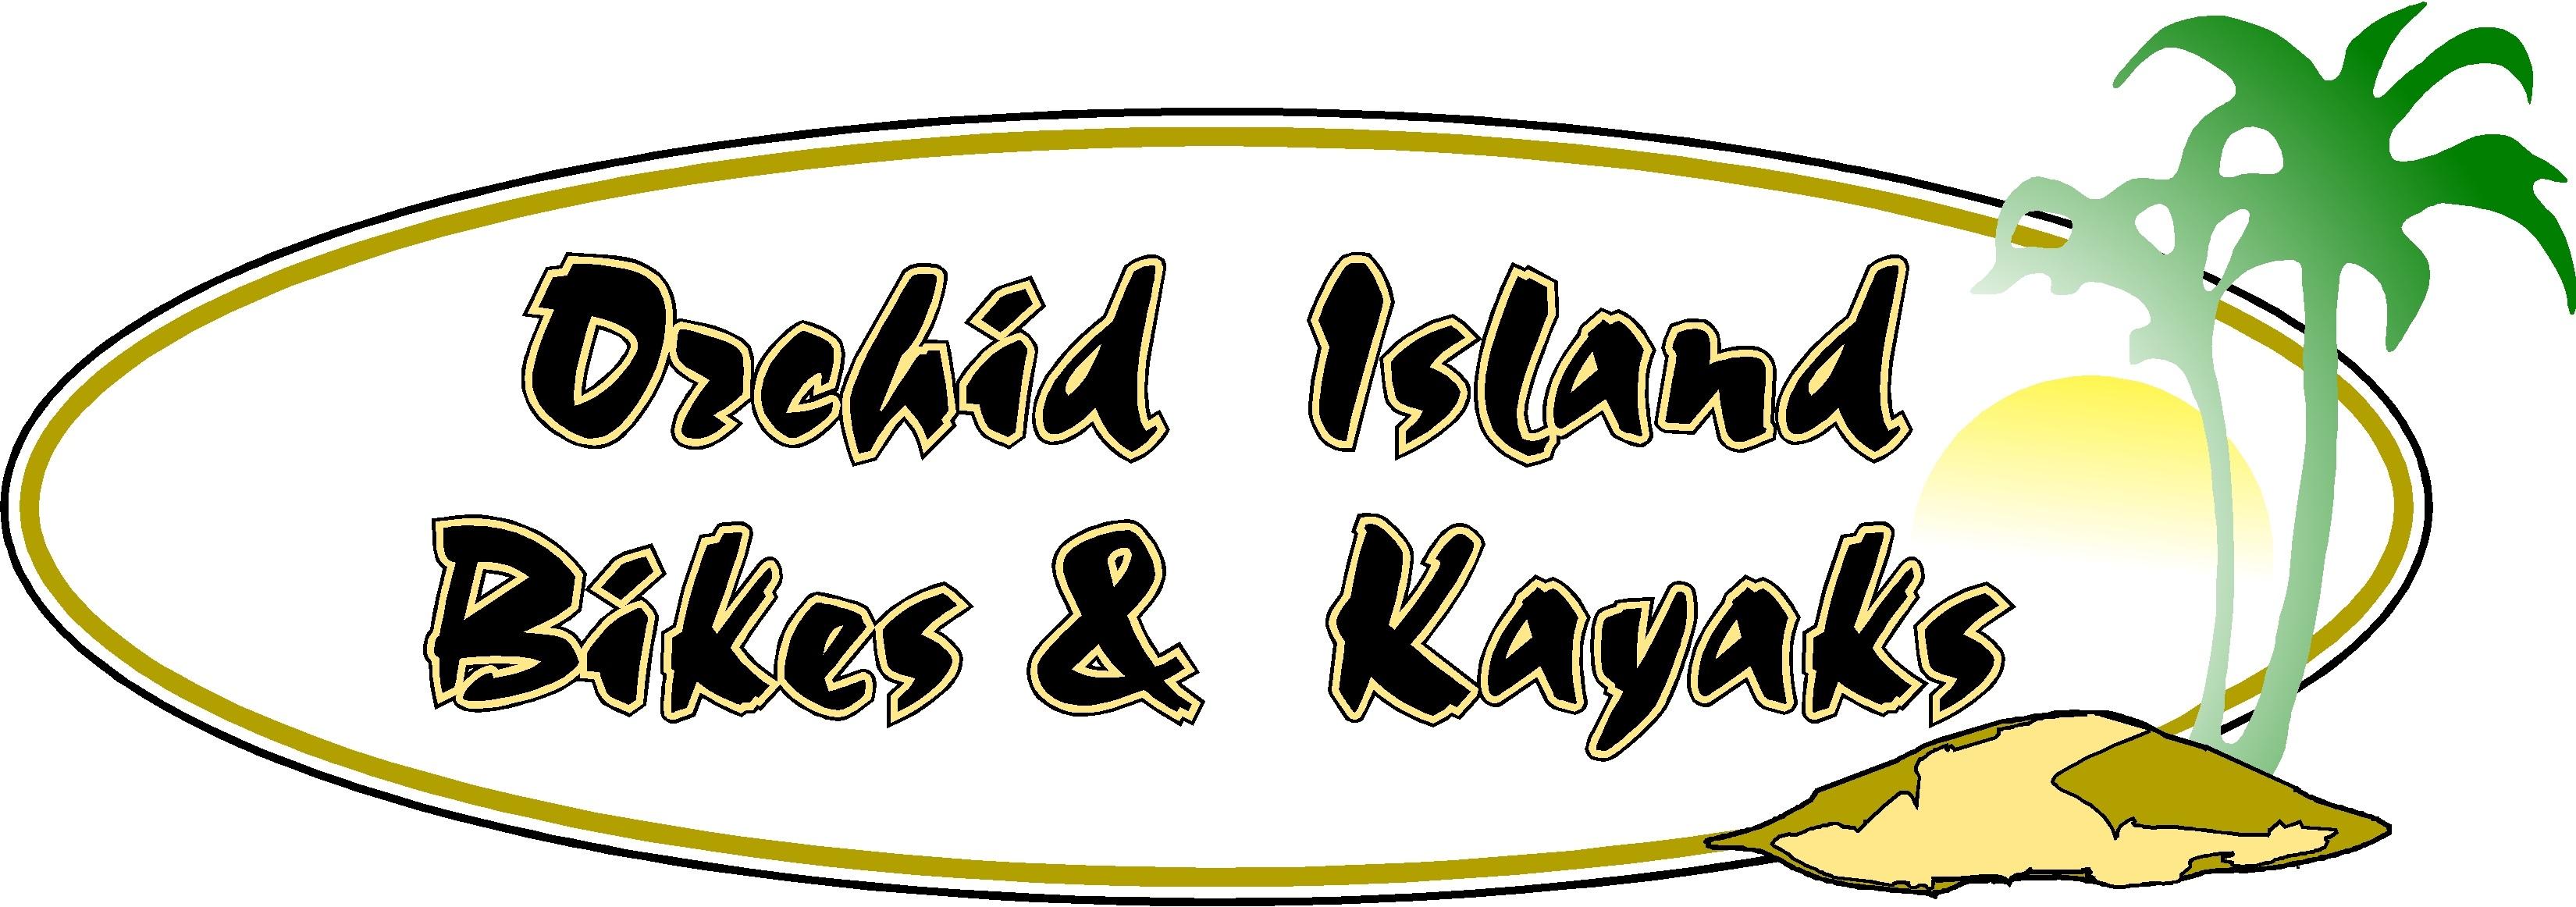 OIR_Bike & Kayak Logo_9-08